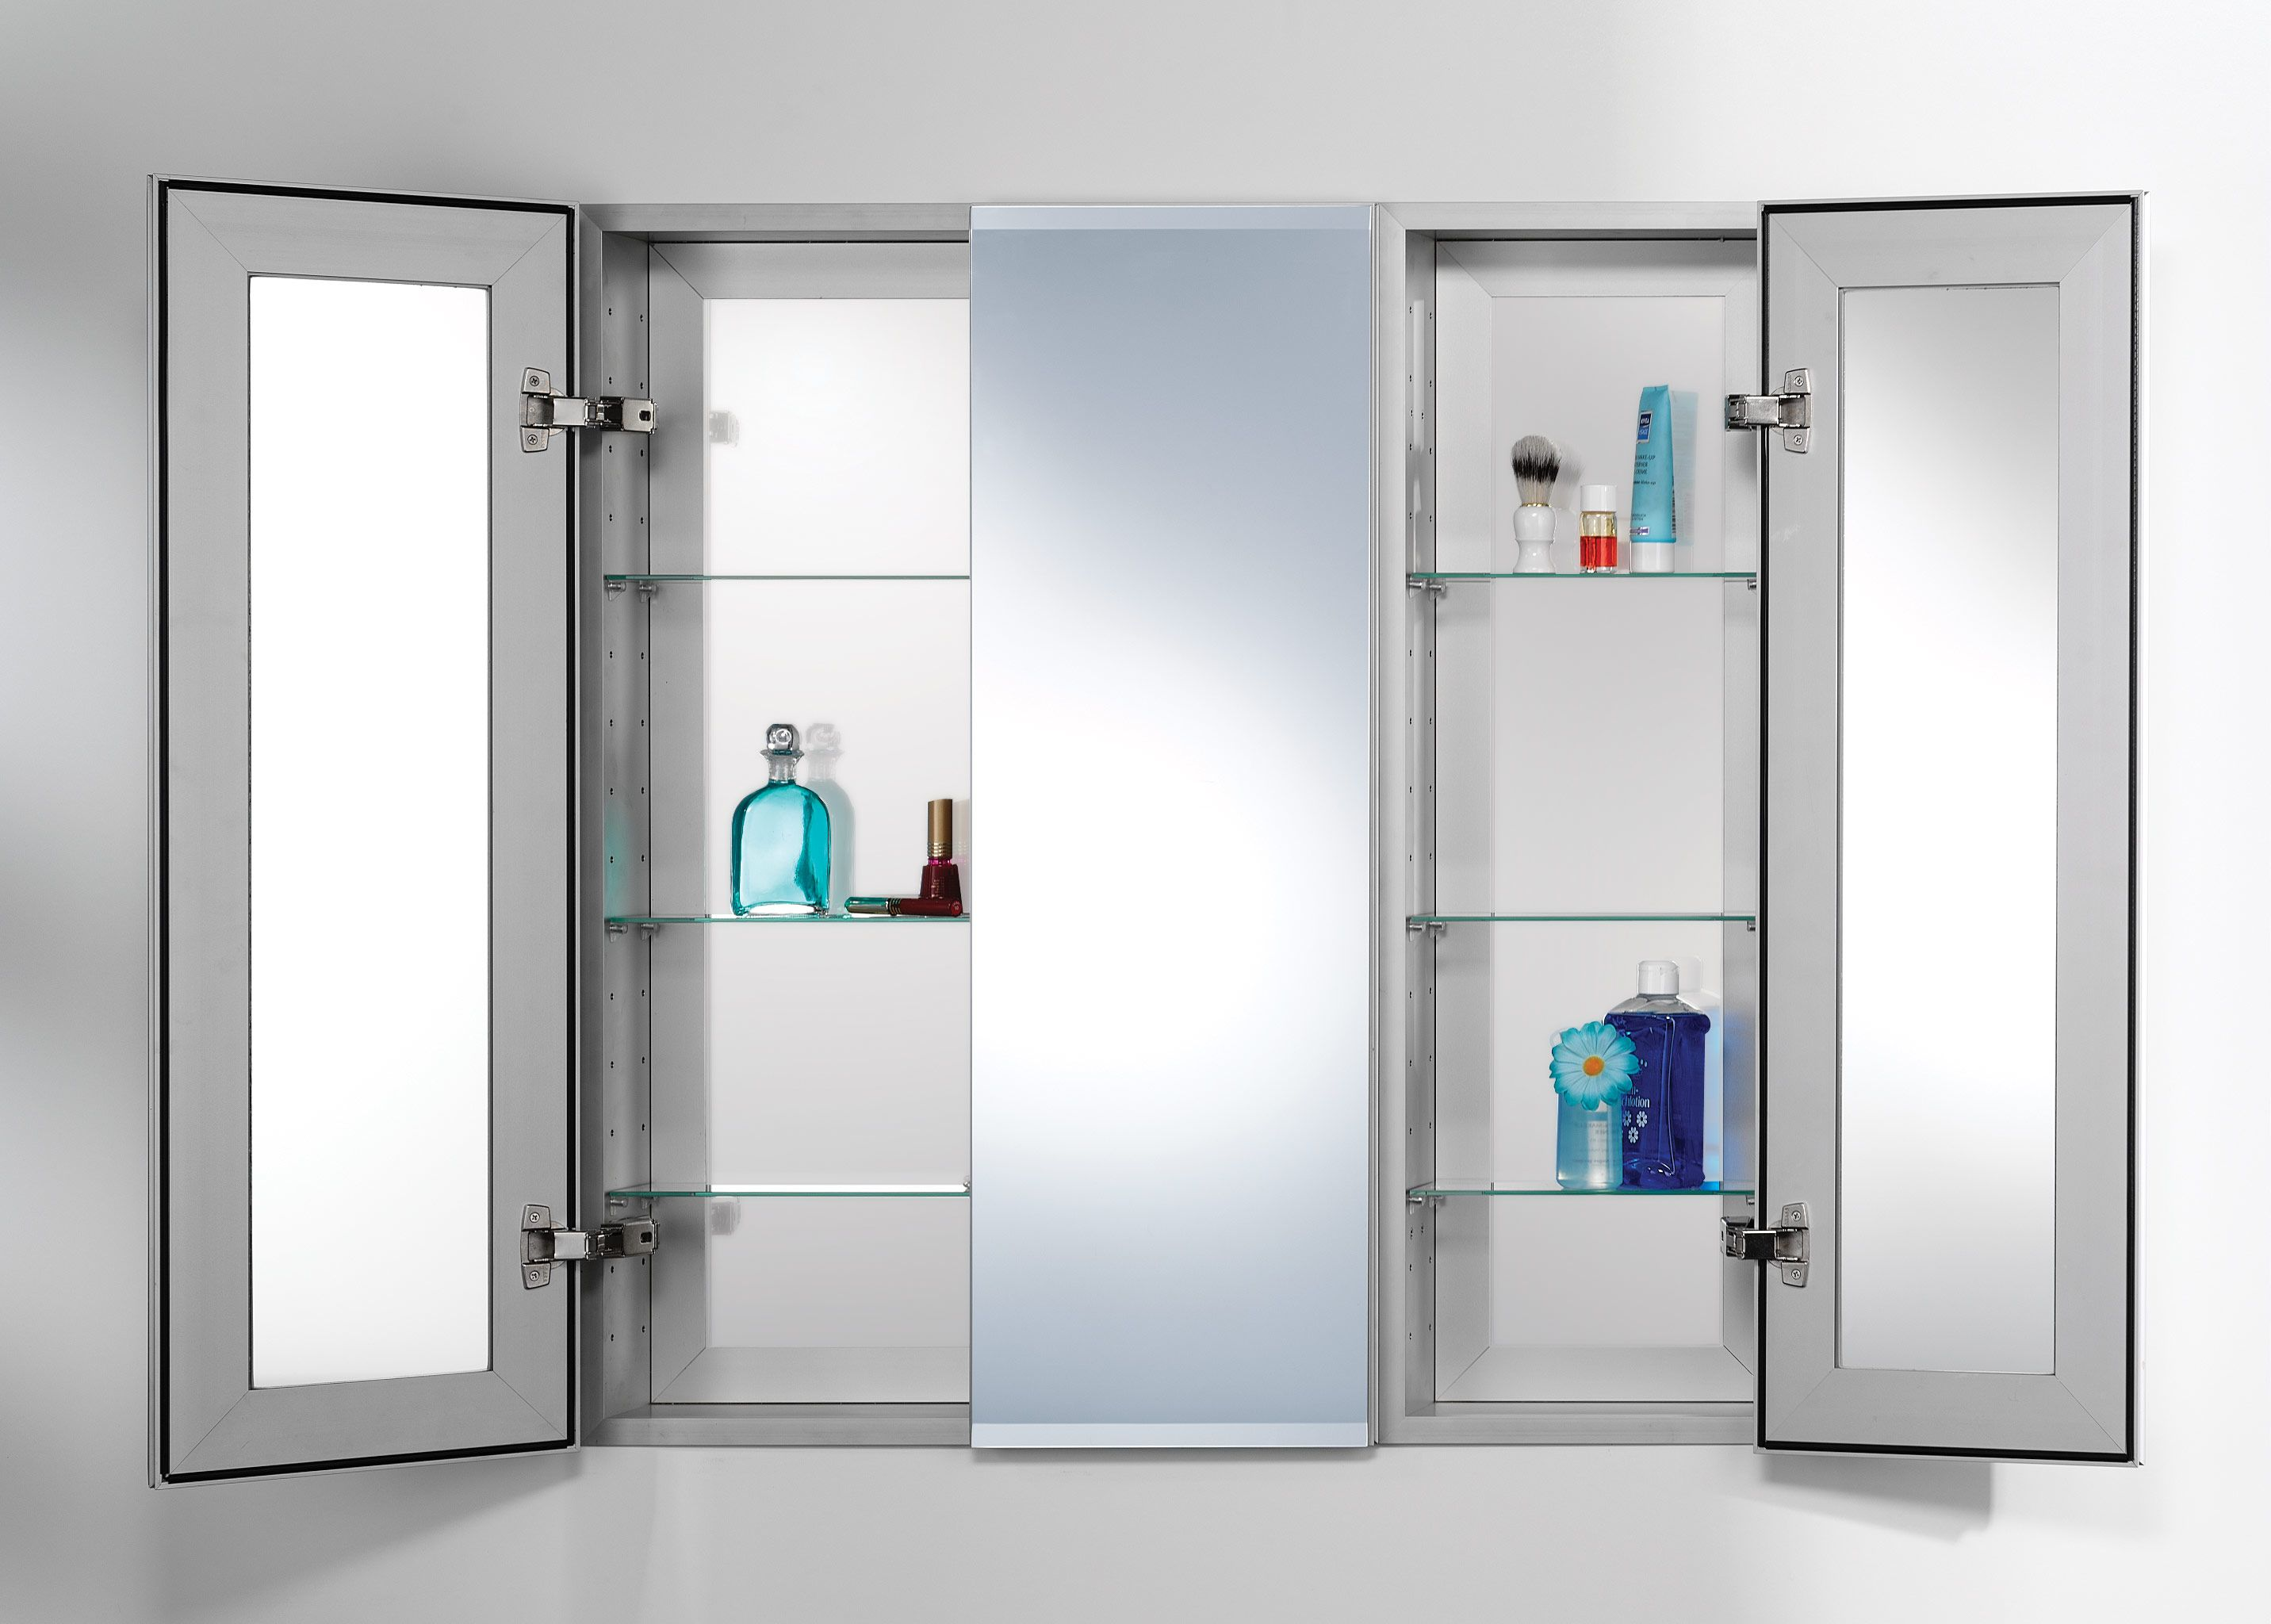 Bathroom Medicine Cabinets U2013 With Lights Recessed Mirrored